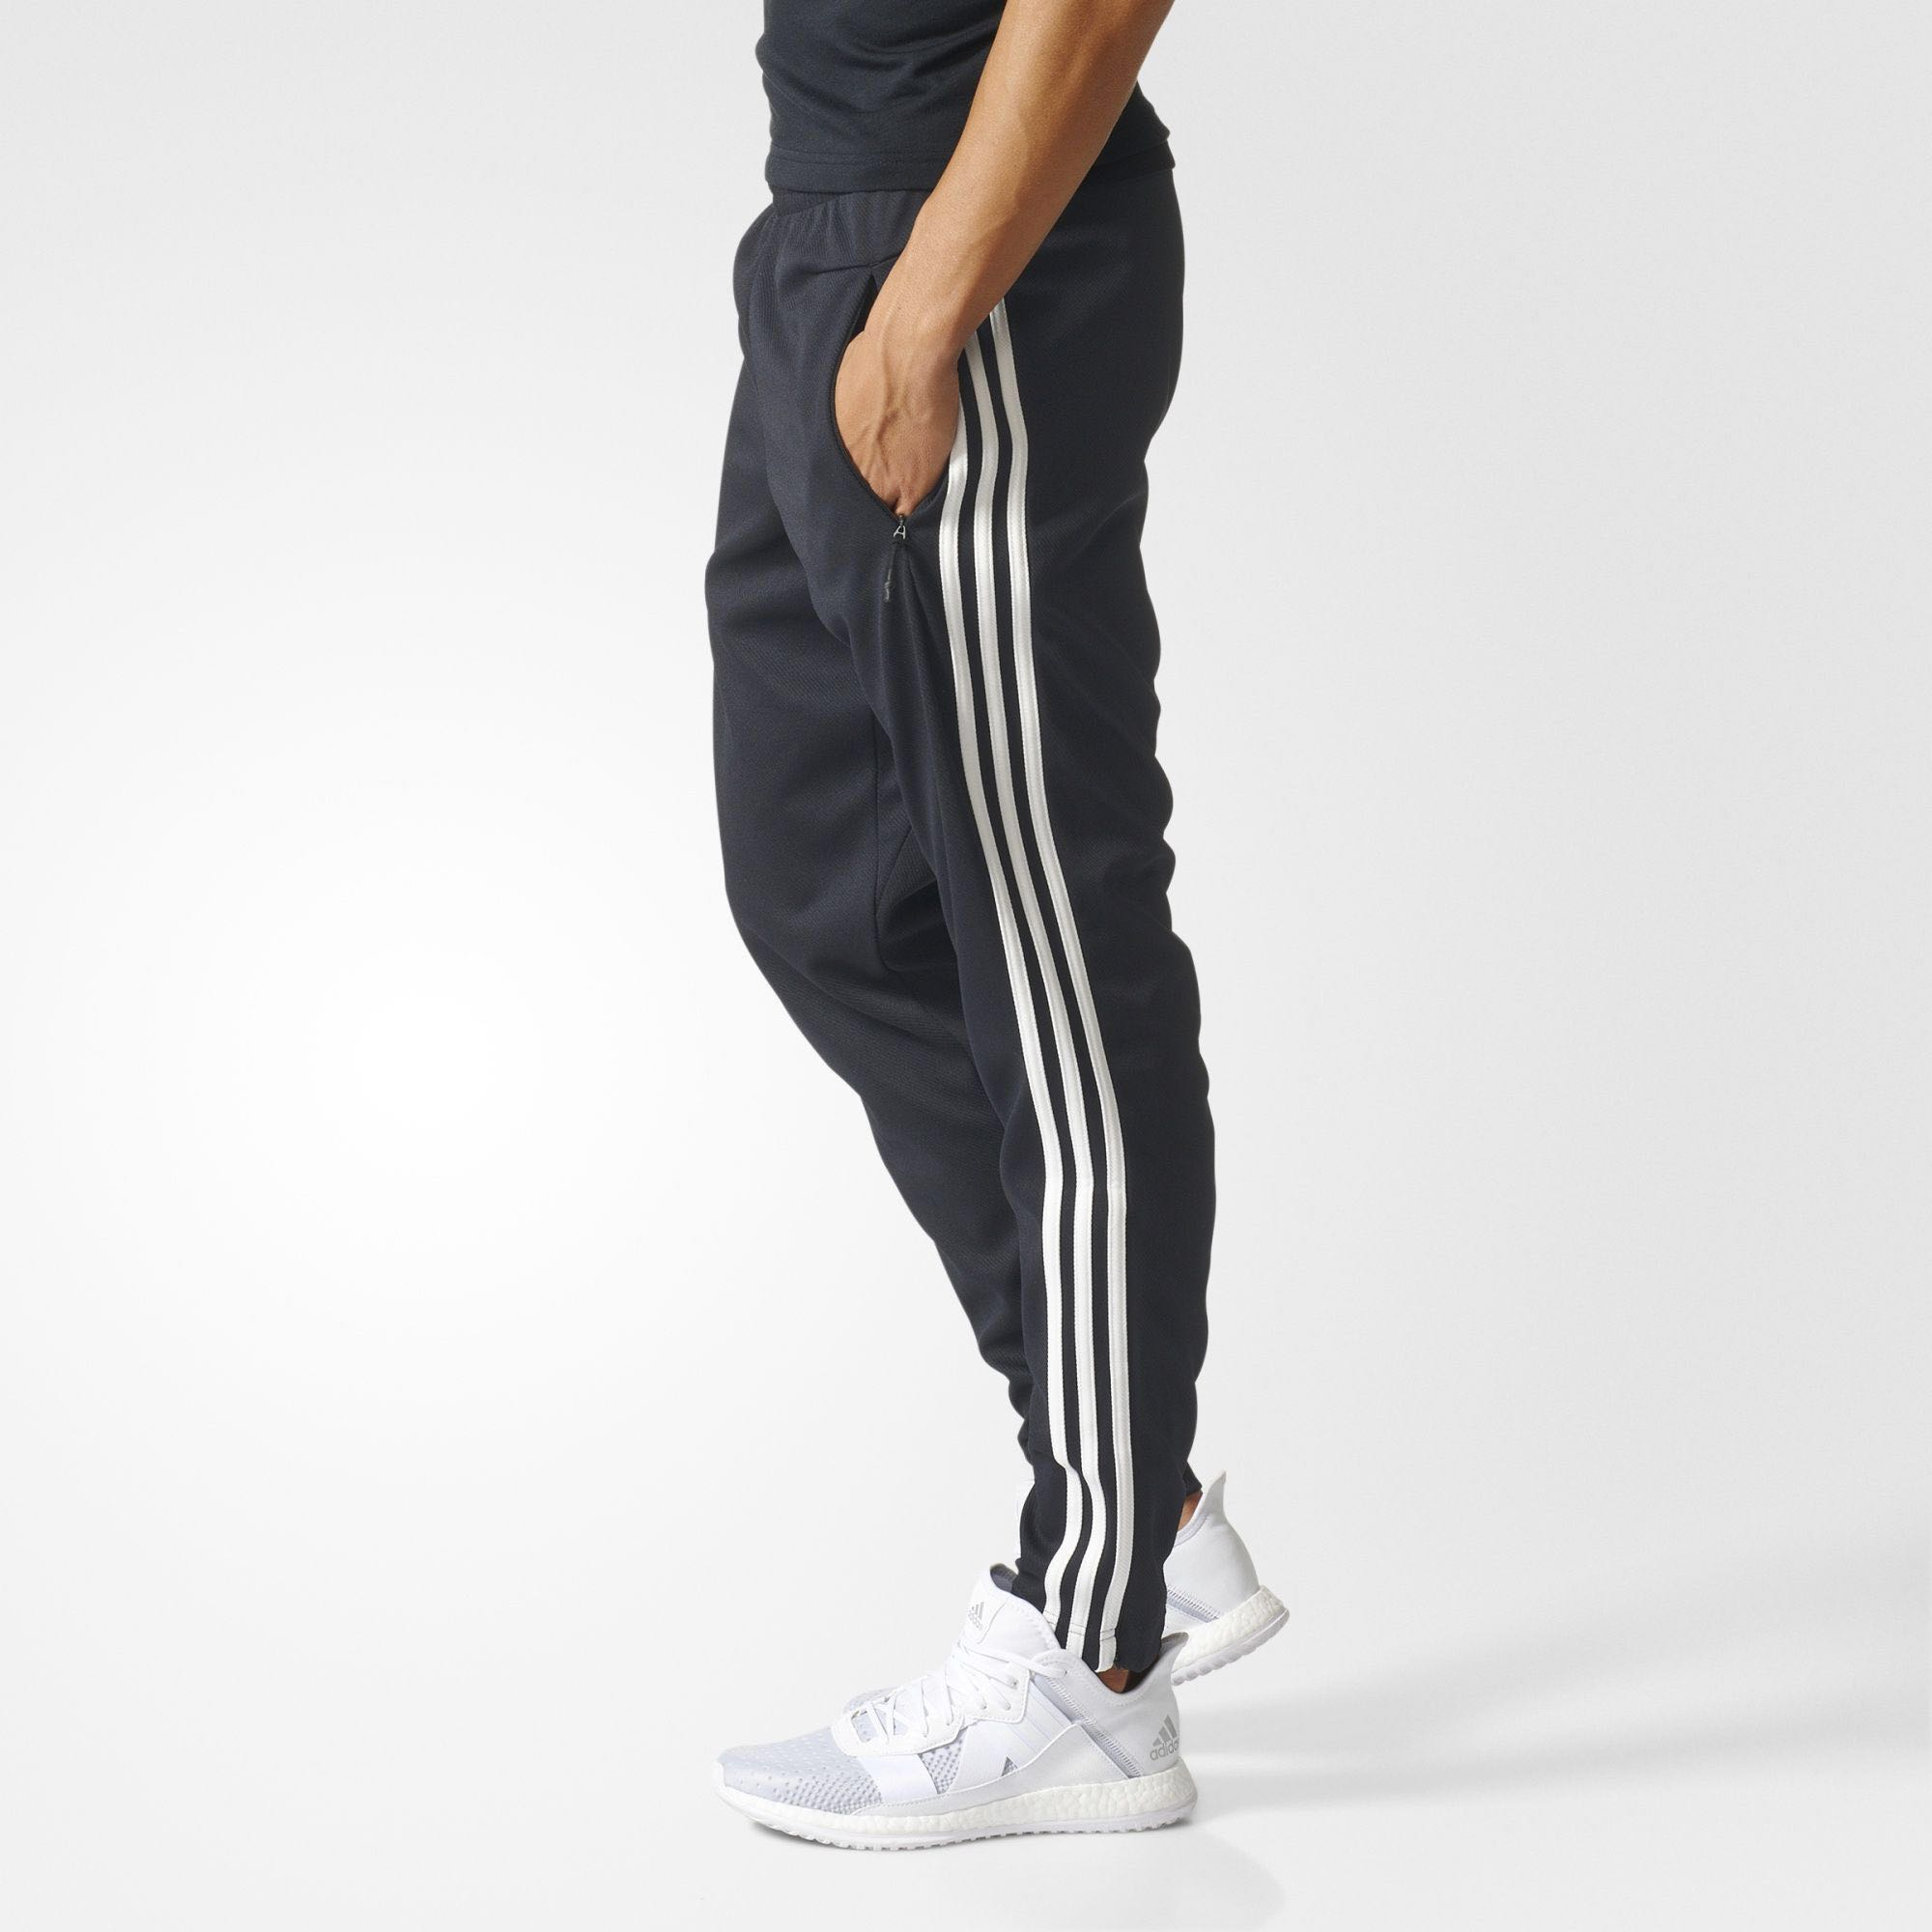 huge discount ad867 394f4 ... Adidas Unisex Tiro 3-Stripe Pants, Men s Fashion, Clothes, Bottoms on  ...